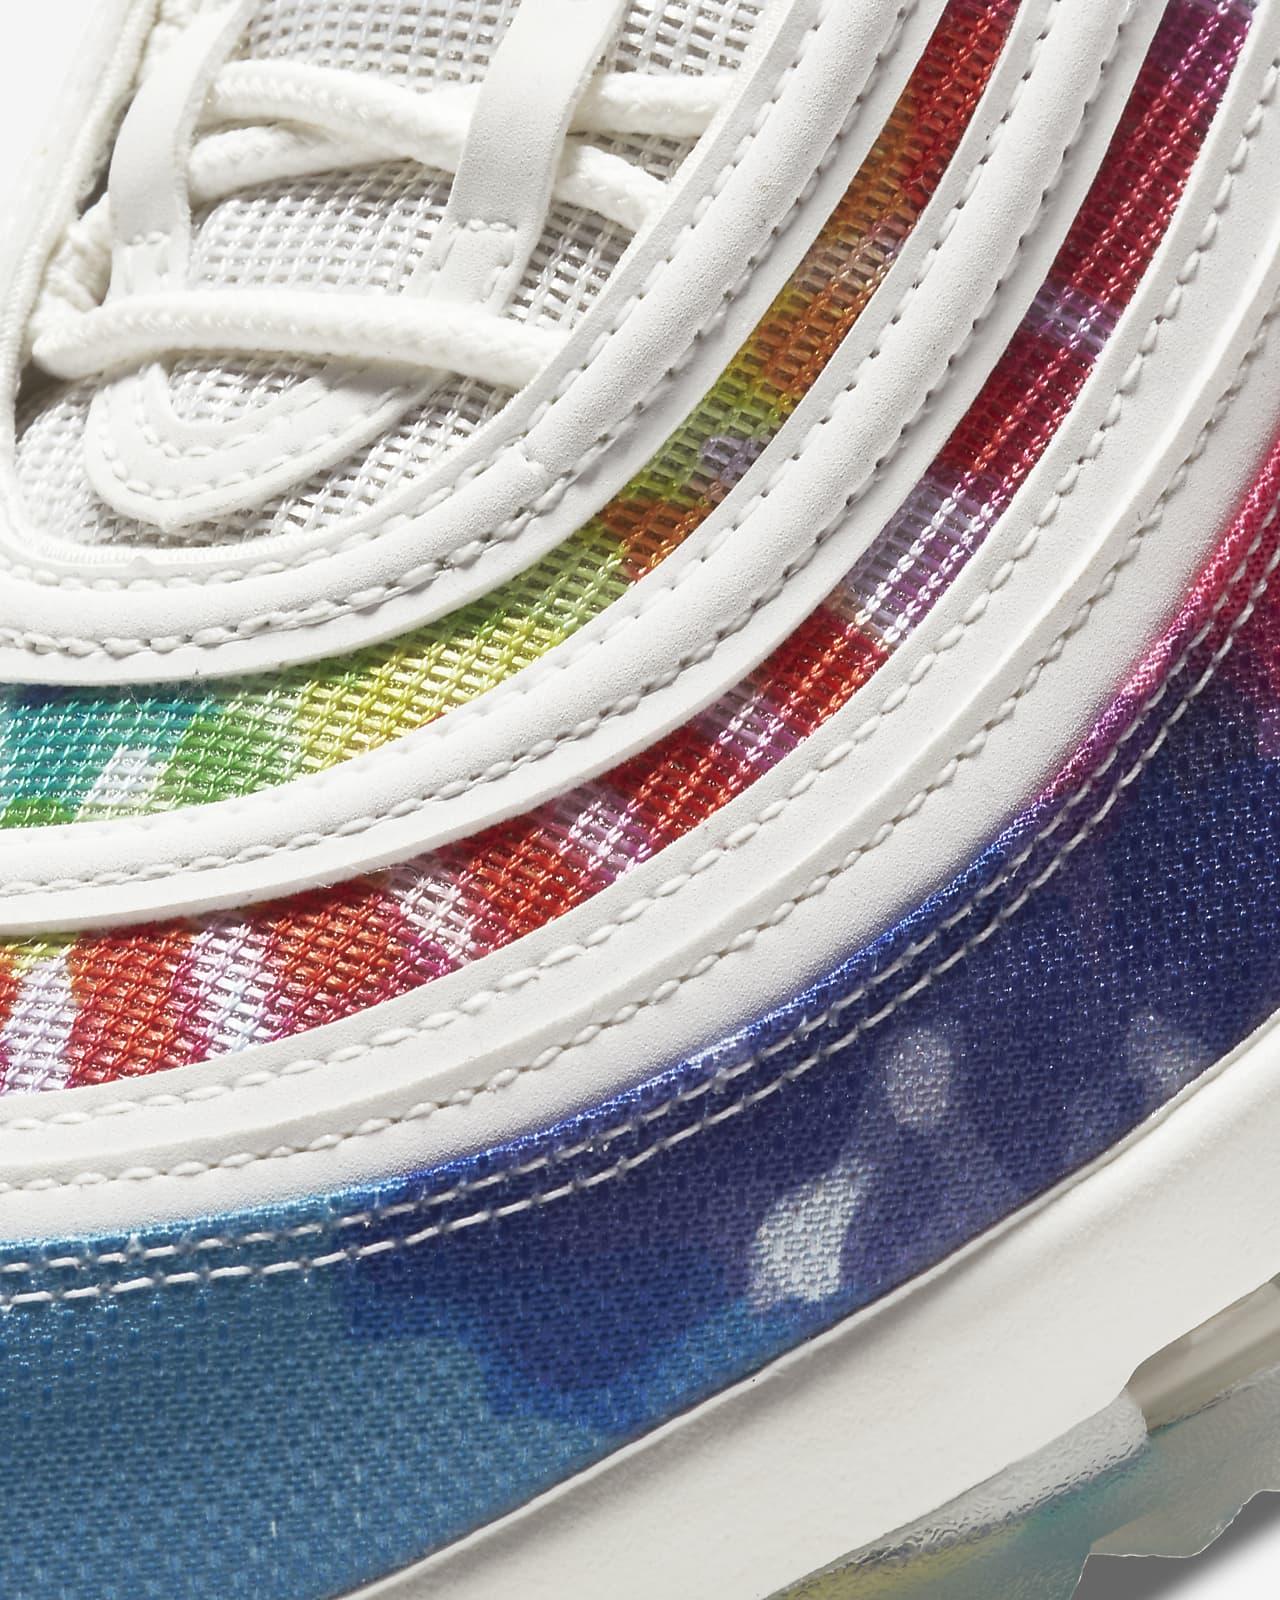 Contratista Deshabilitar Confiar  NIke Air Max 97 G NRG P 男/女高尔夫球鞋-耐克(Nike)中国官网